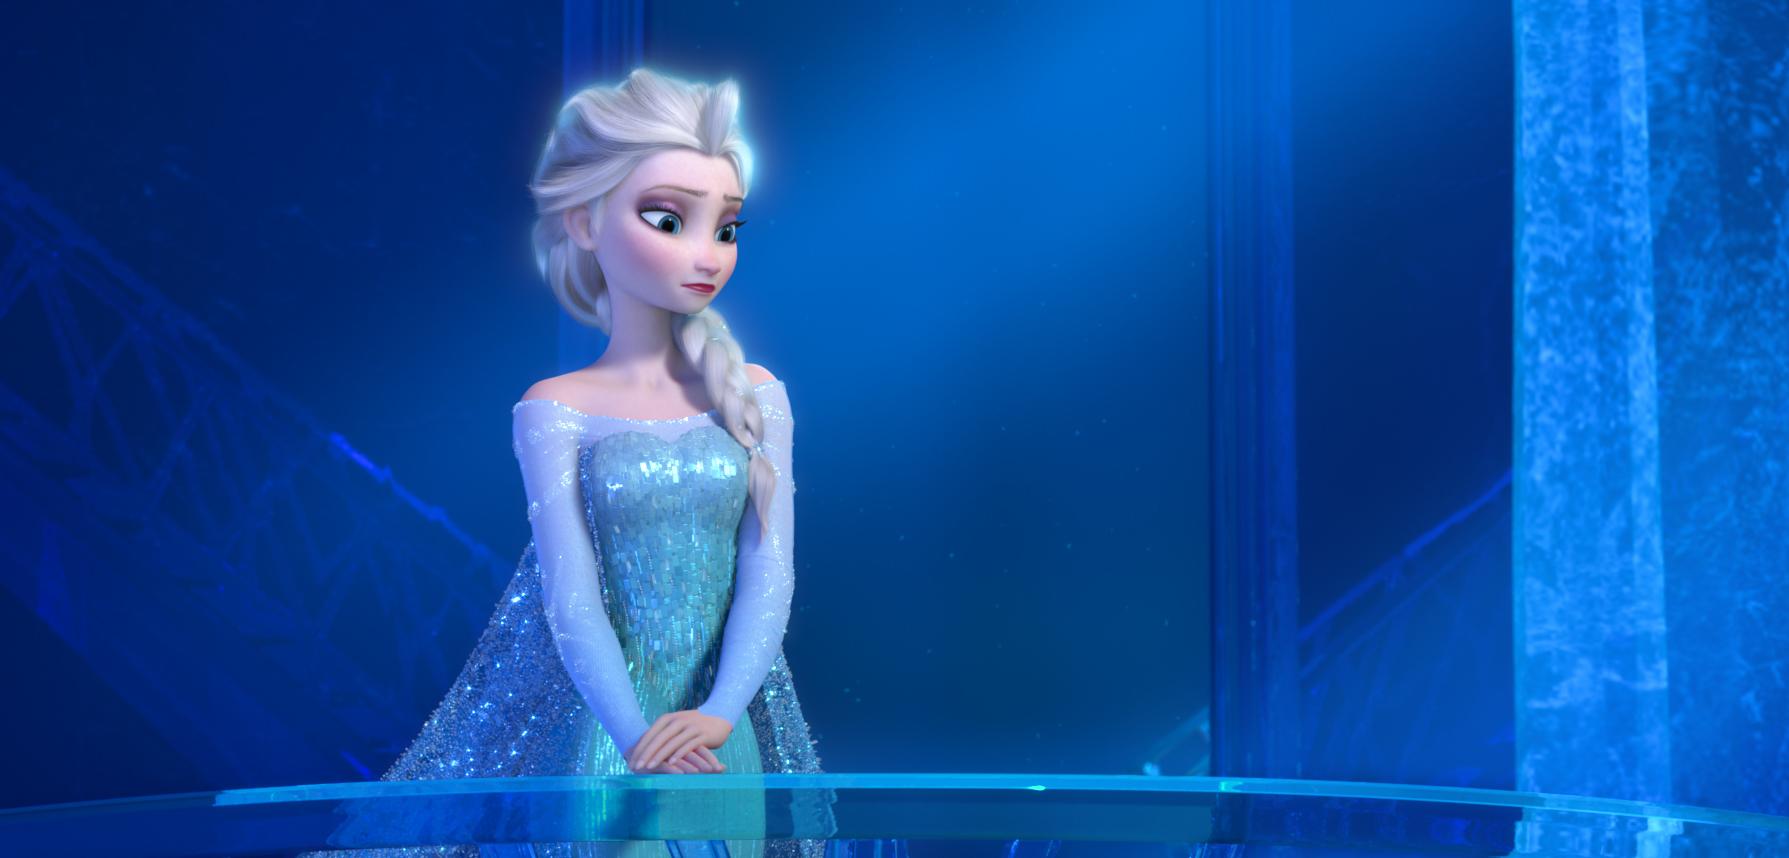 A 'Frozen' retail supply angers parents, saddens kids